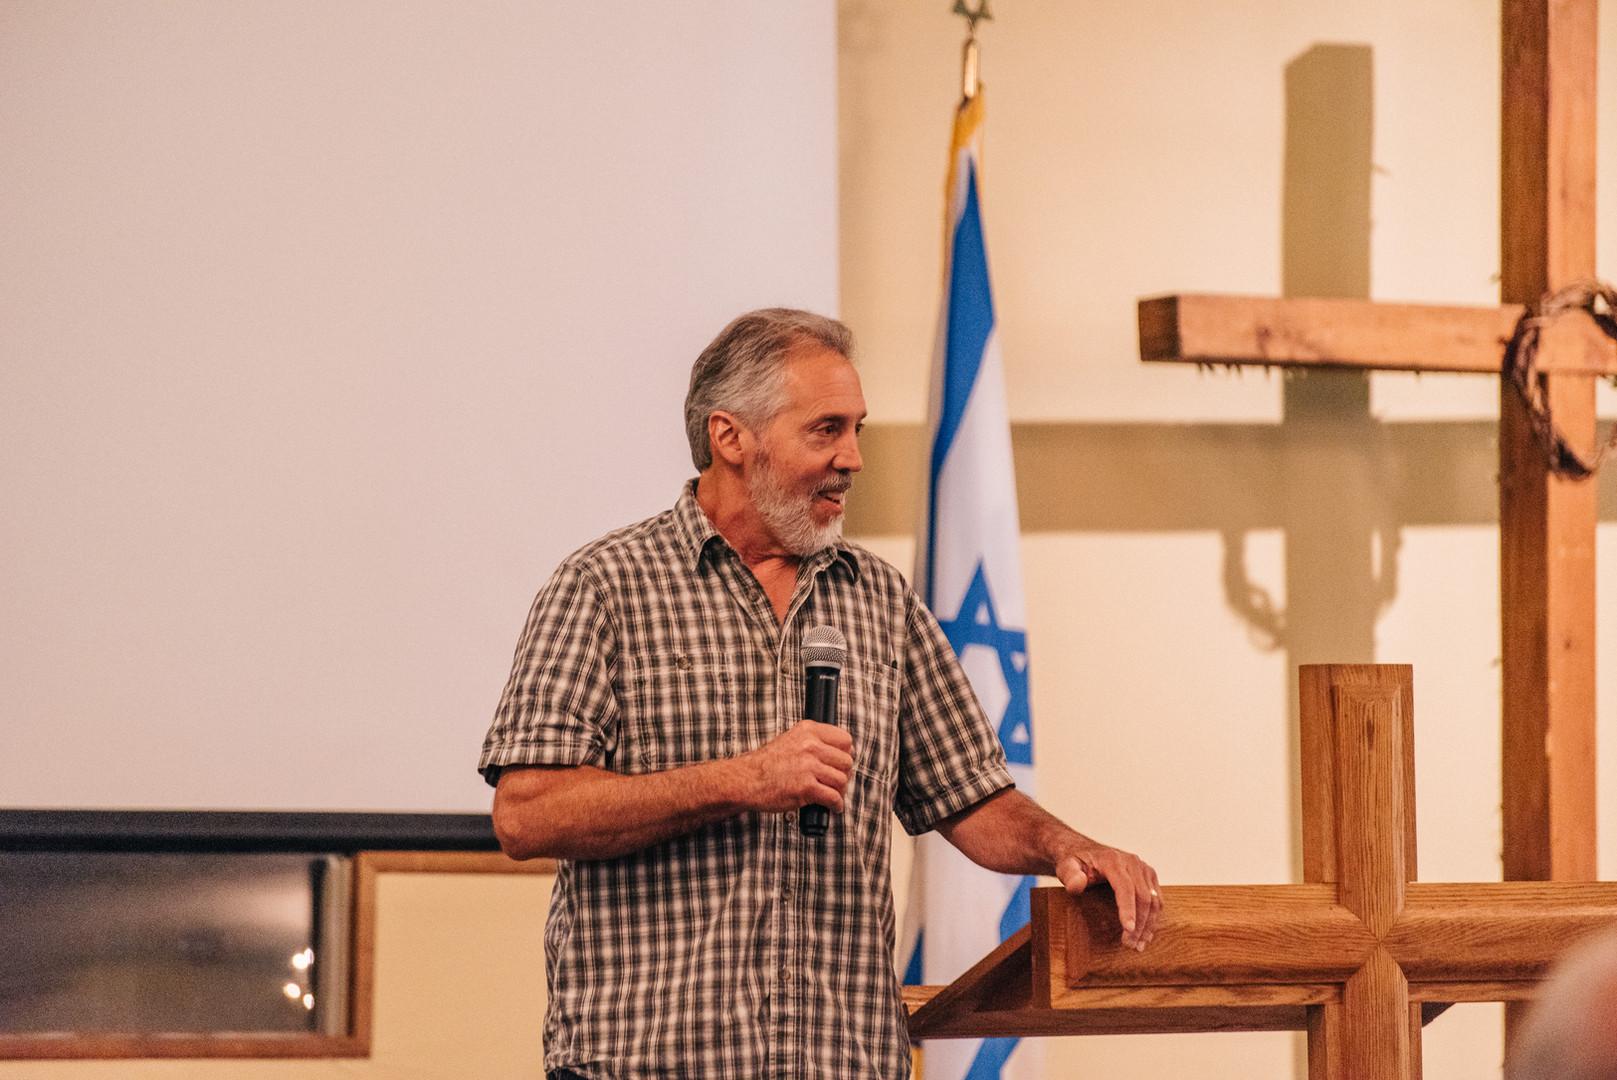 Assistant Pastor Tom Collucci